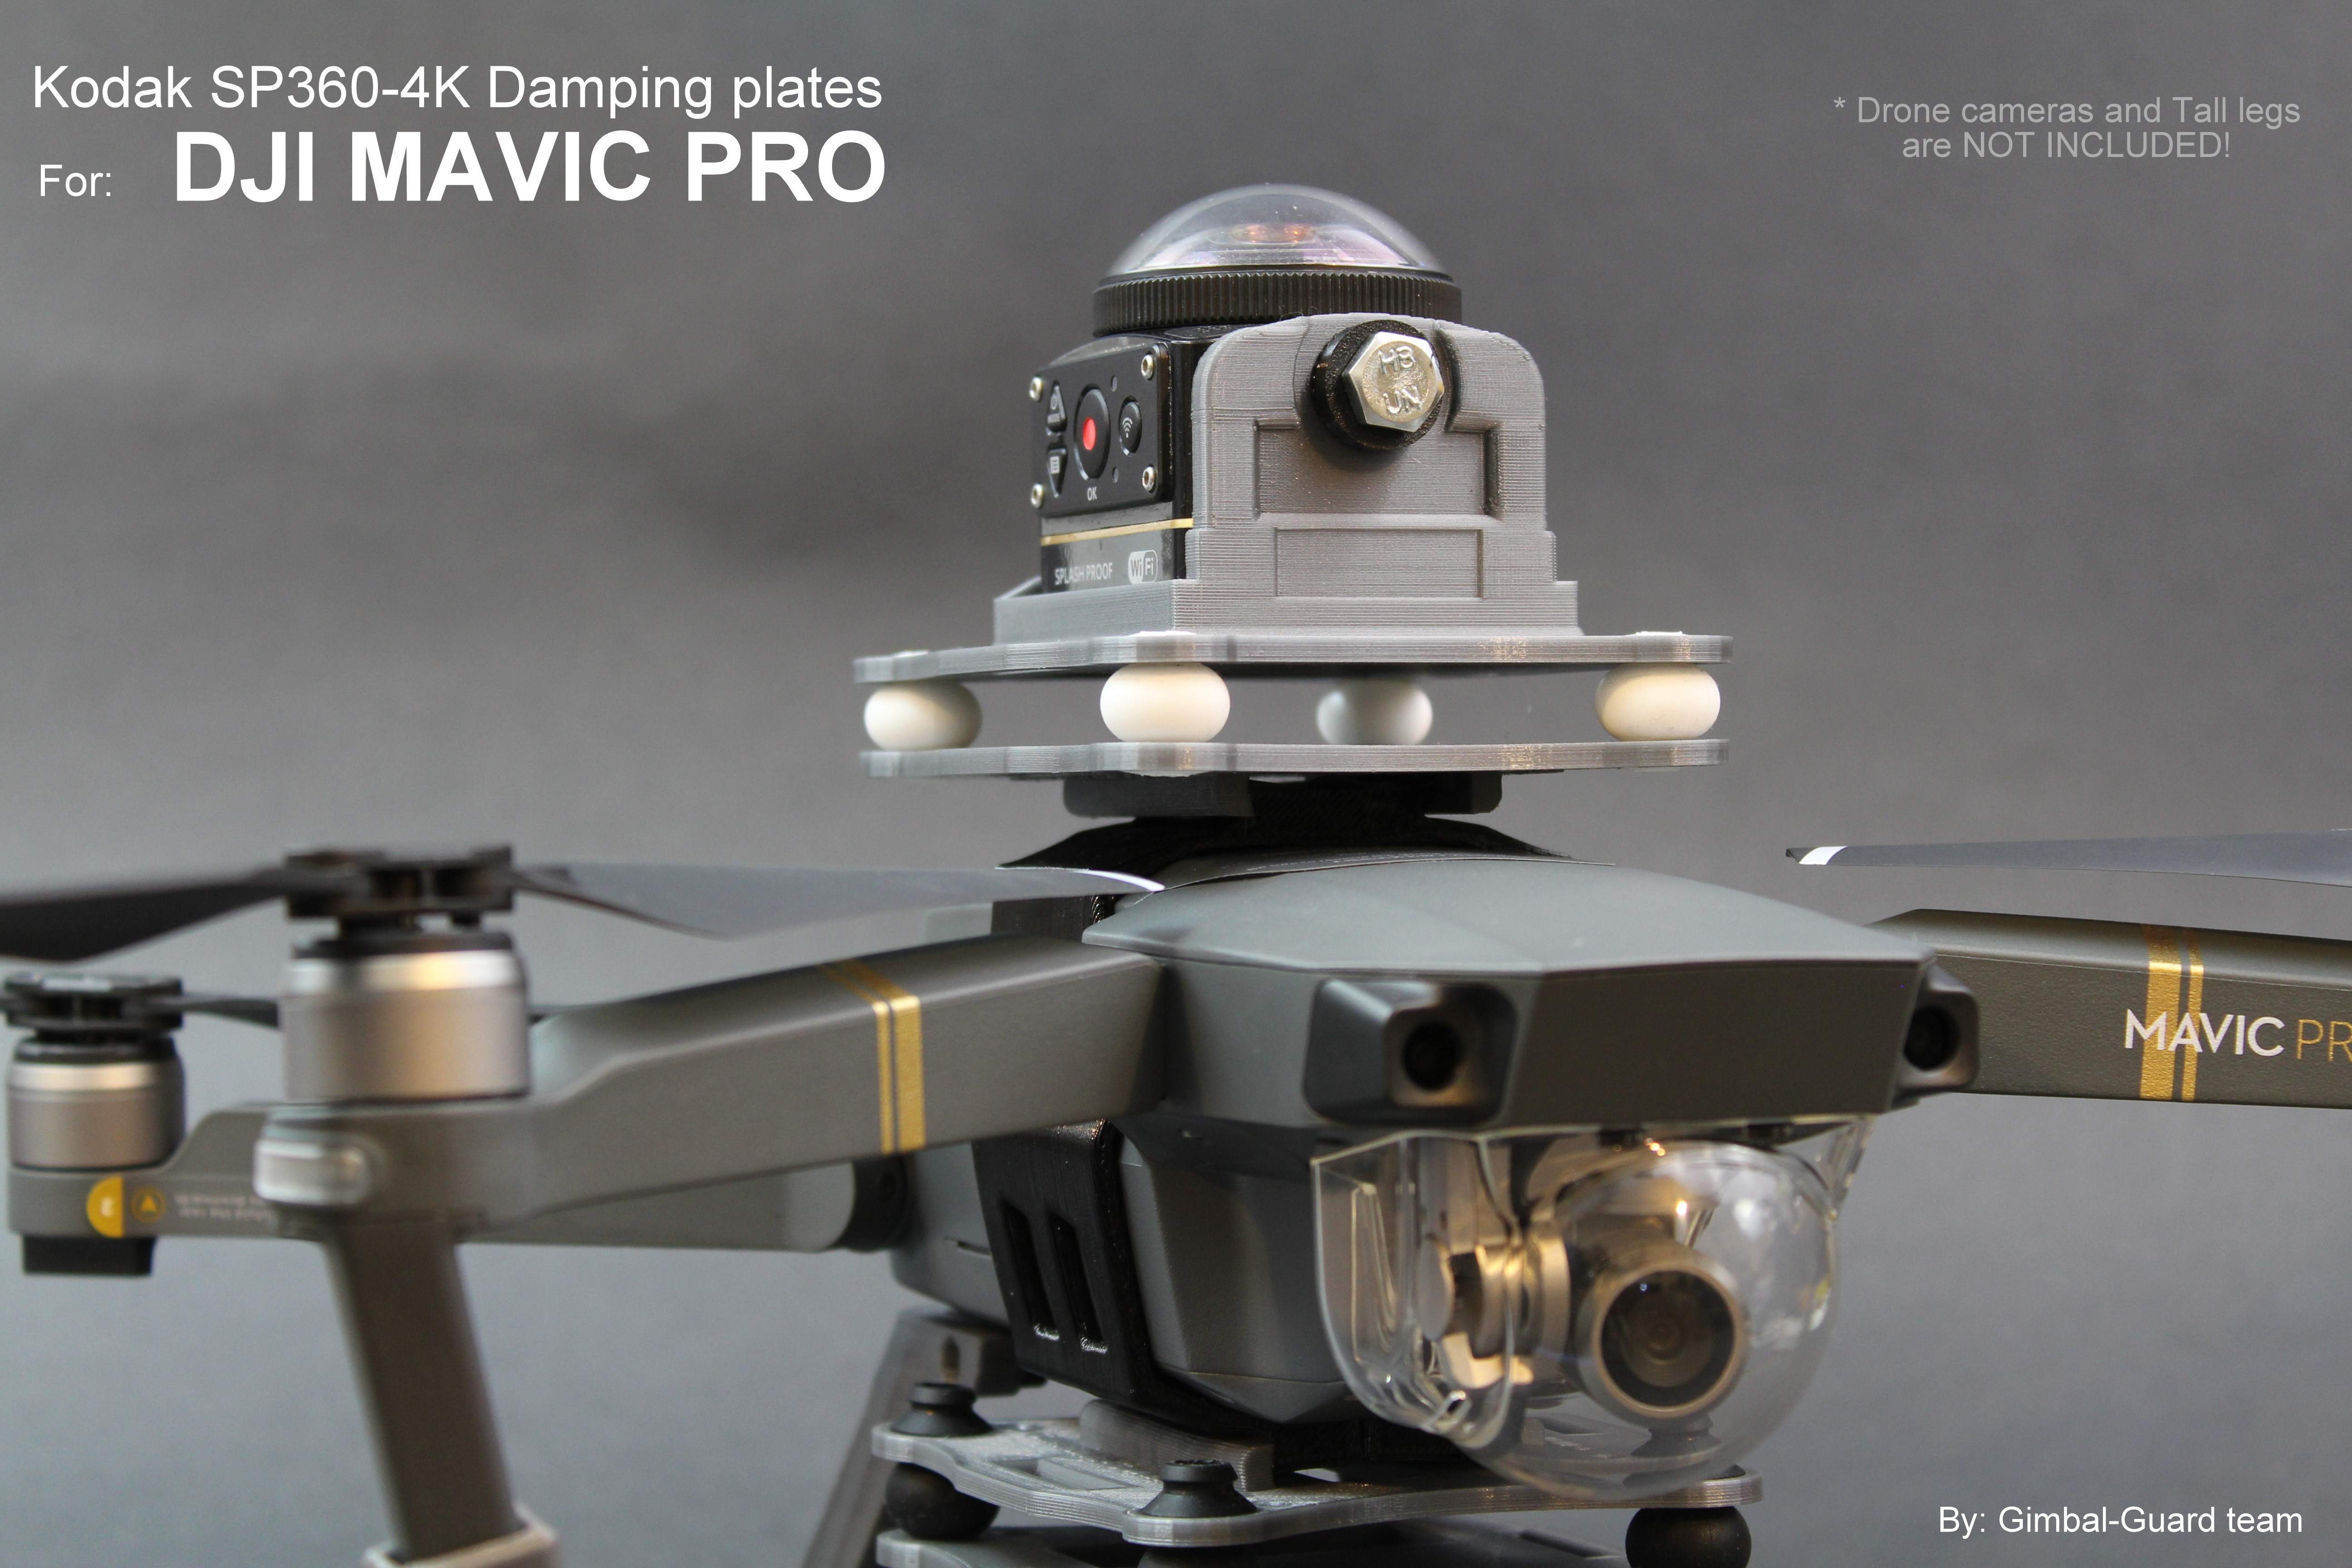 gimbal-guard-dji-Mavic Pro22.JPG